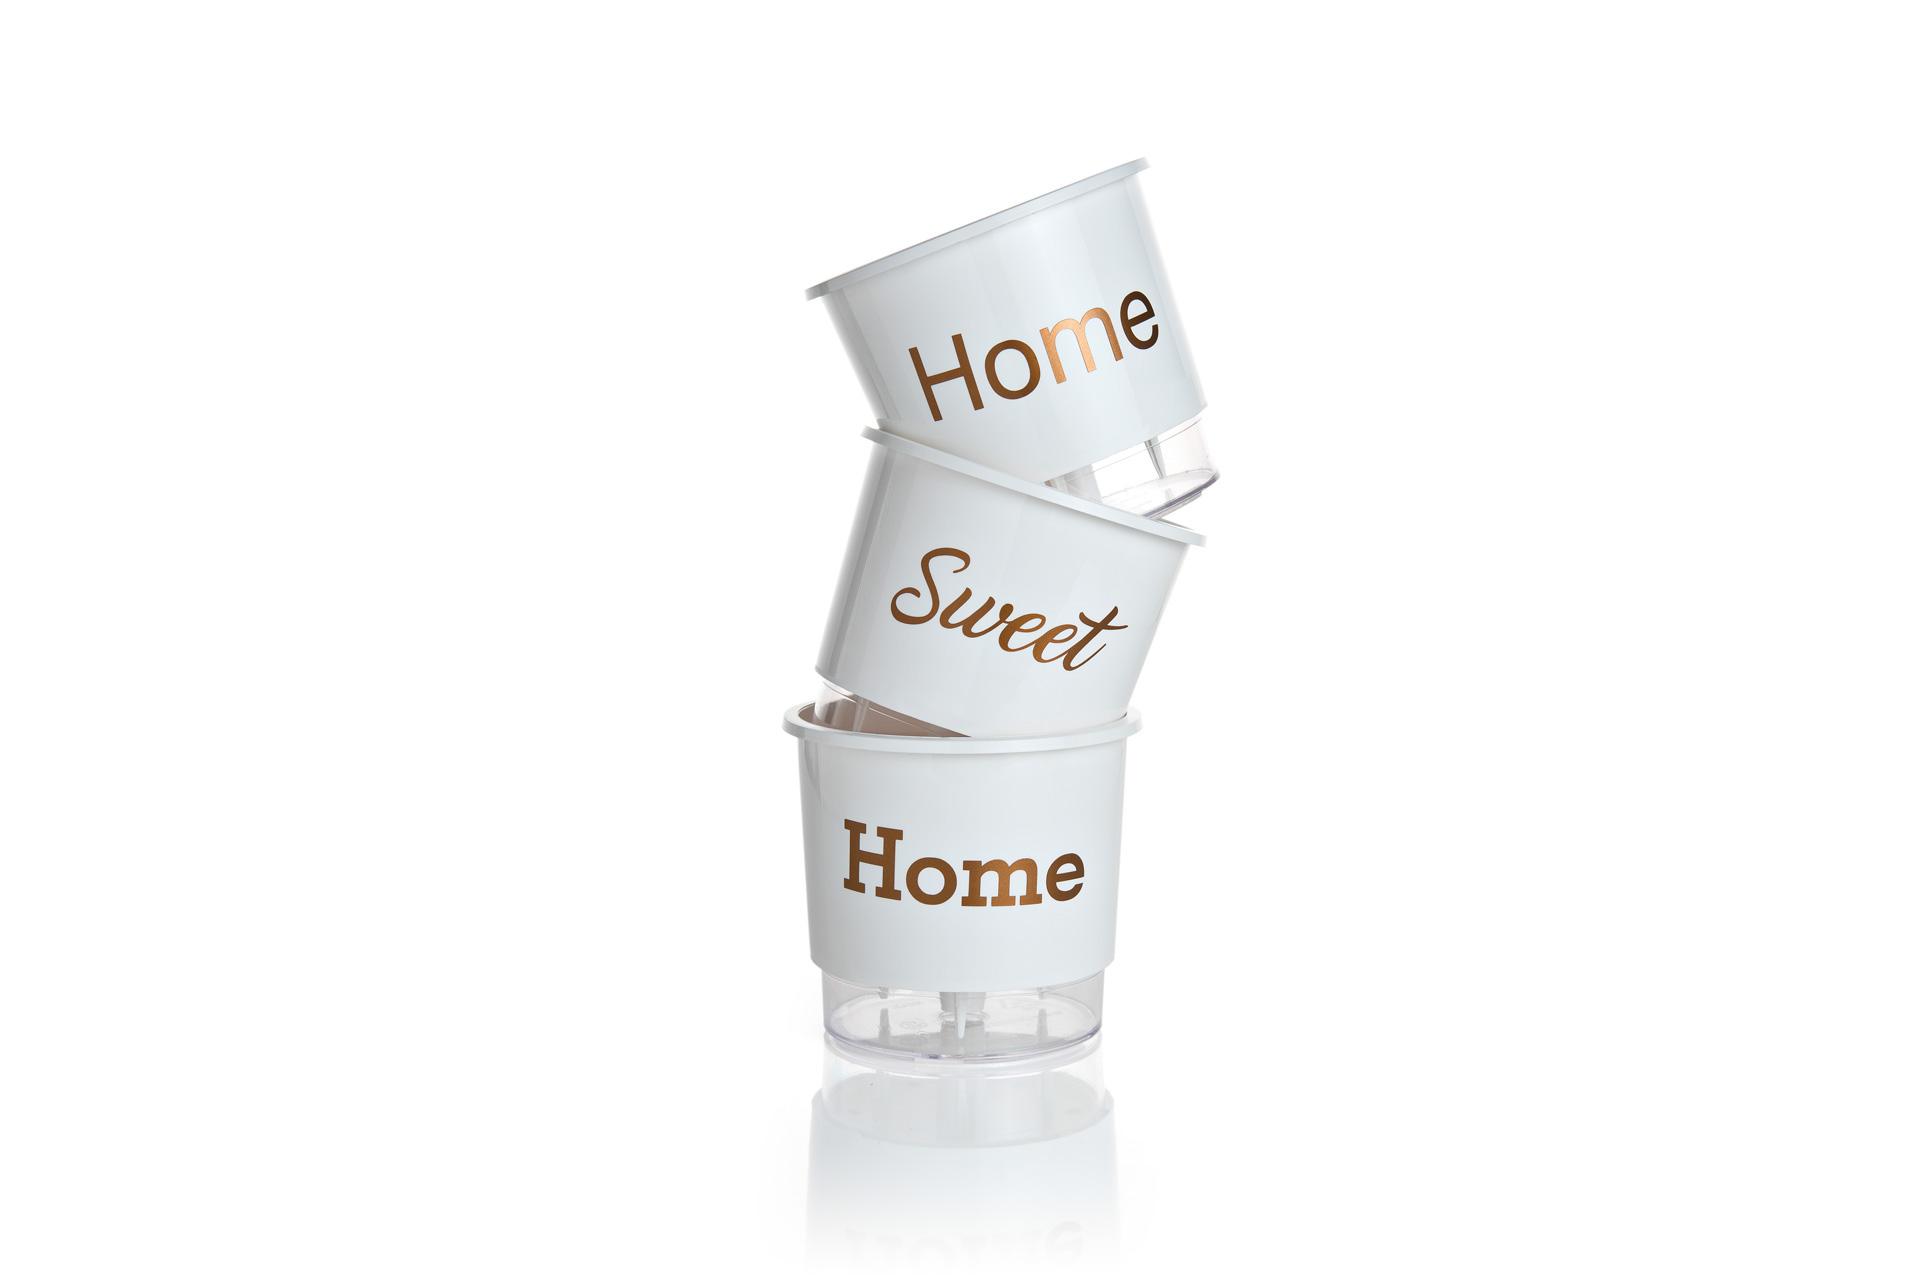 Conjunto 3 Vasos Autoirrigáveis Branco Pequenos 12cm x 11cm Home Sweet Home  - Loja Raiz